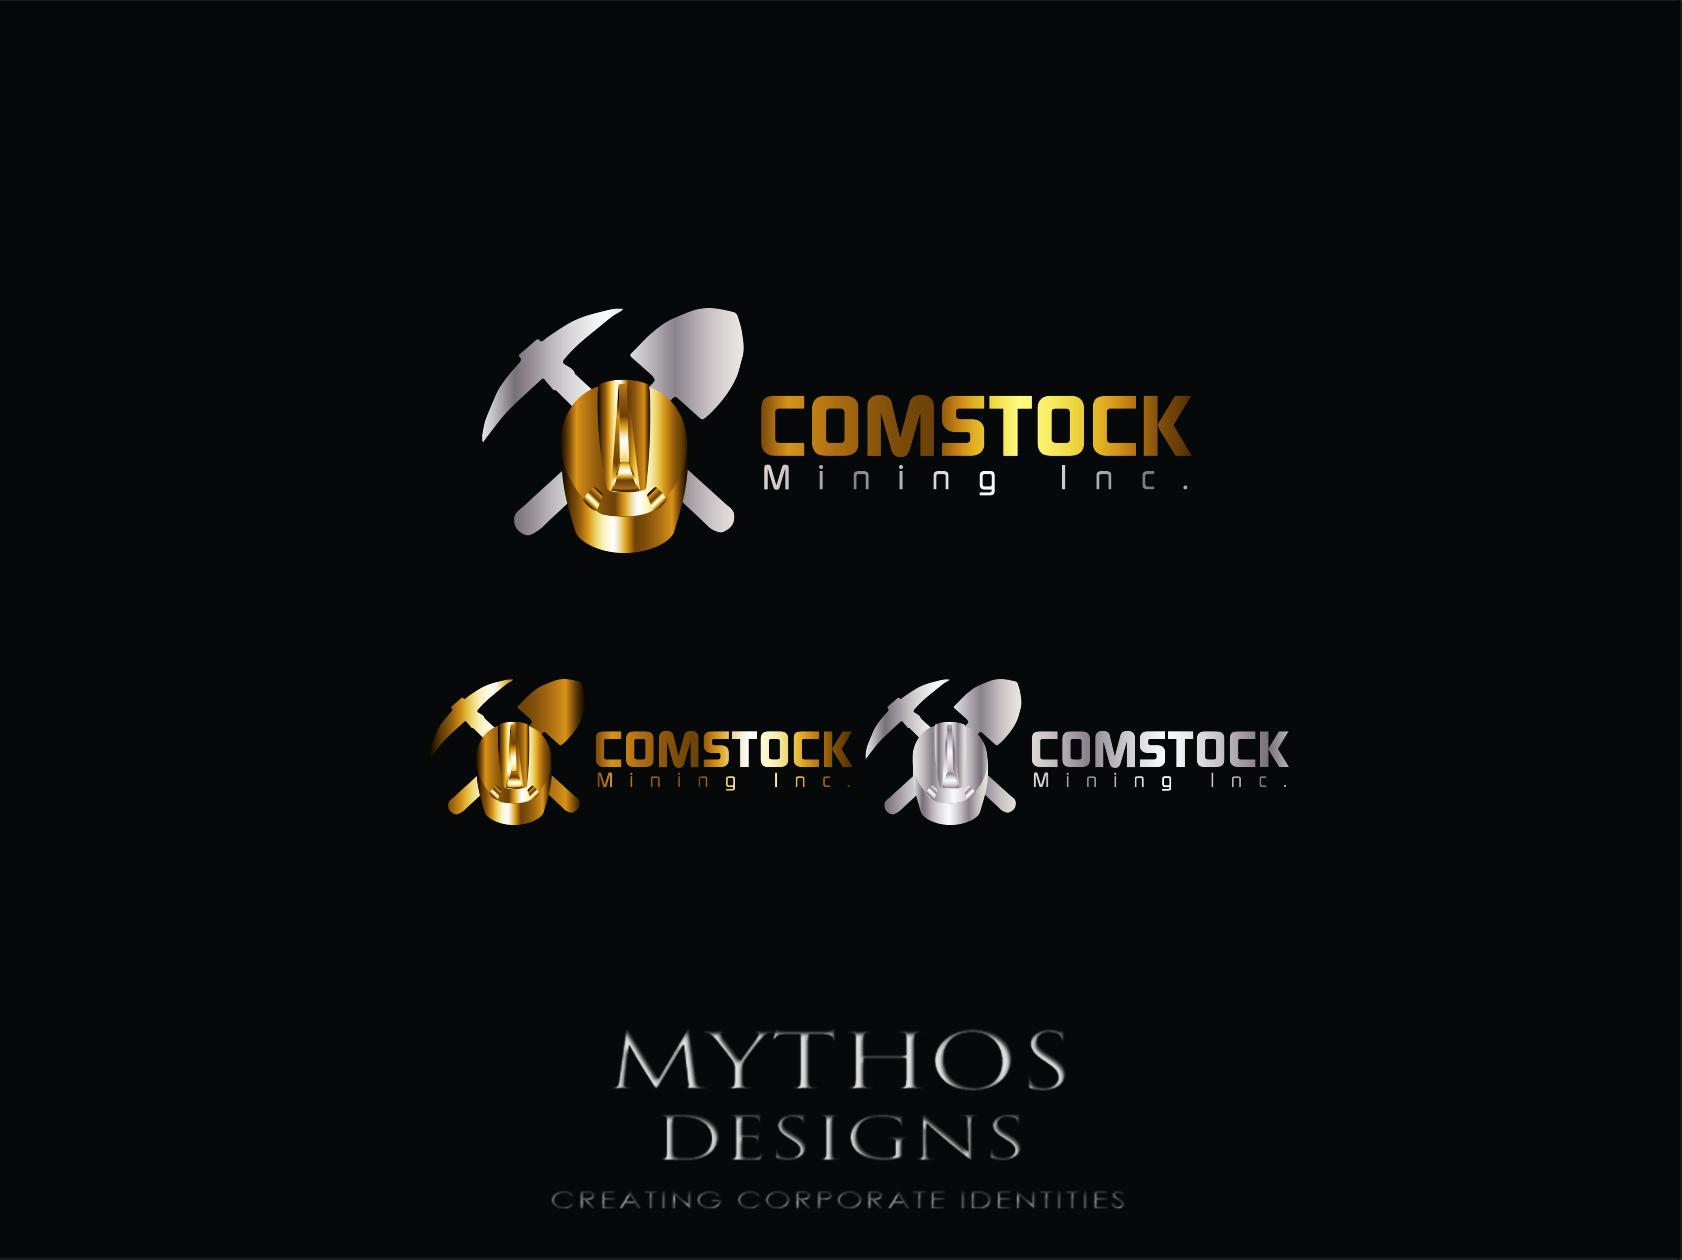 Logo Design by Mythos Designs - Entry No. 162 in the Logo Design Contest Captivating Logo Design for Comstock Mining, Inc..